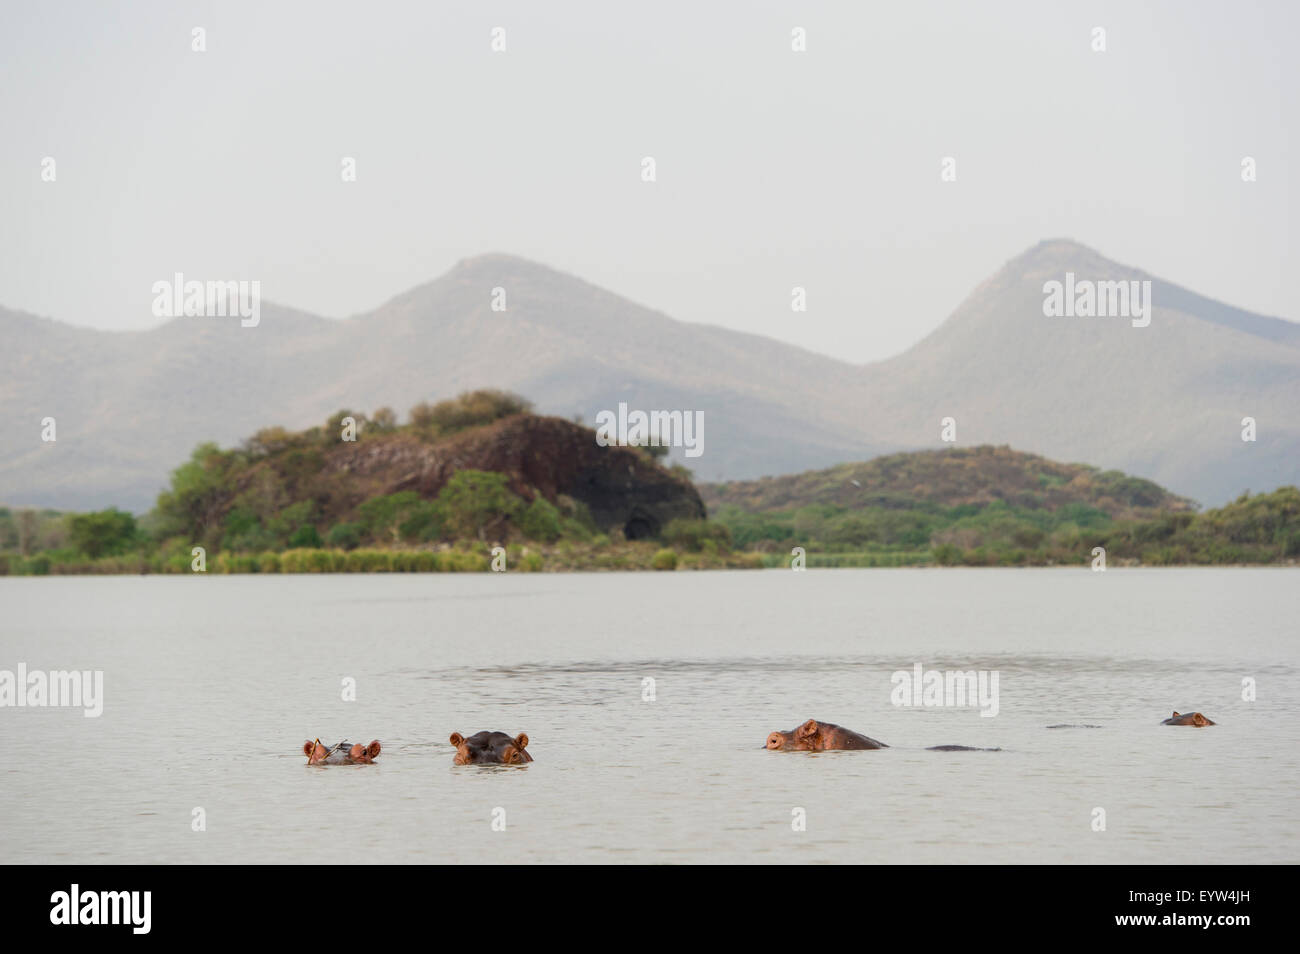 Common hippopotamus (Hippopotamus amphibius), Lake Chamo, Nechisar National Park, Ethiopia Stock Photo